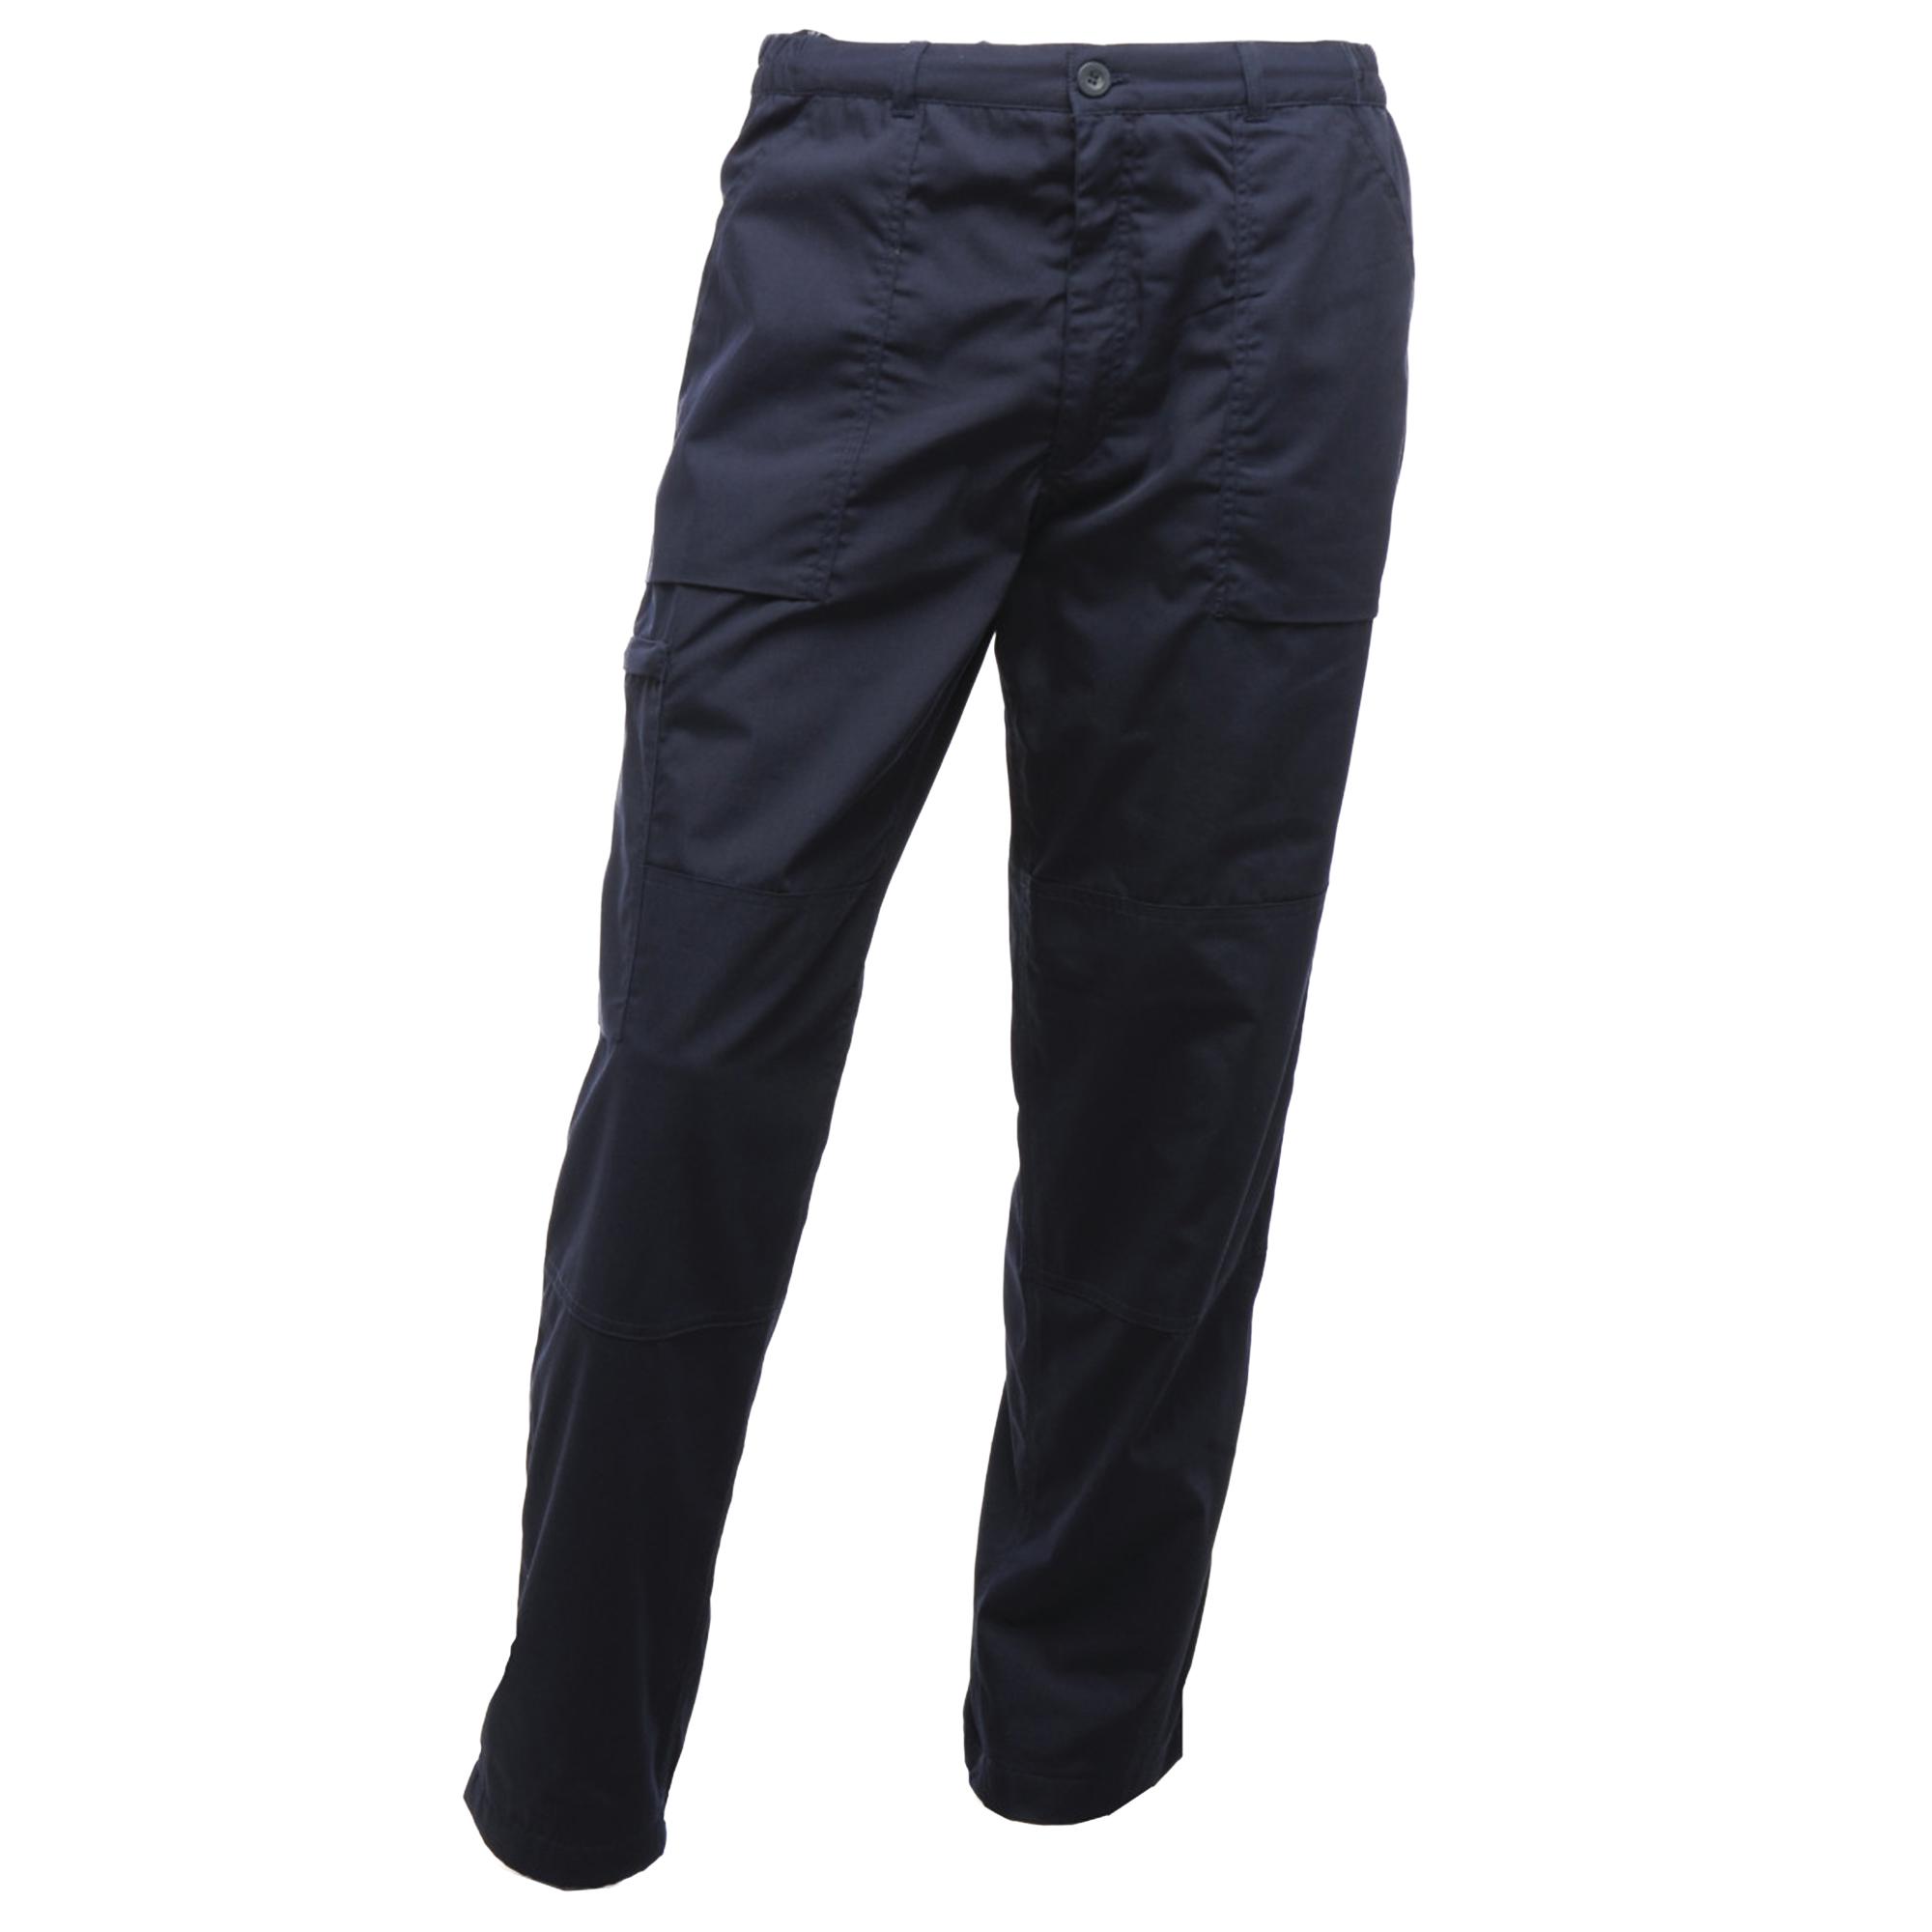 Regatta Mens New Lined Action Trousers (Reg) / Pants (42W x Regular) (Navy Blue)